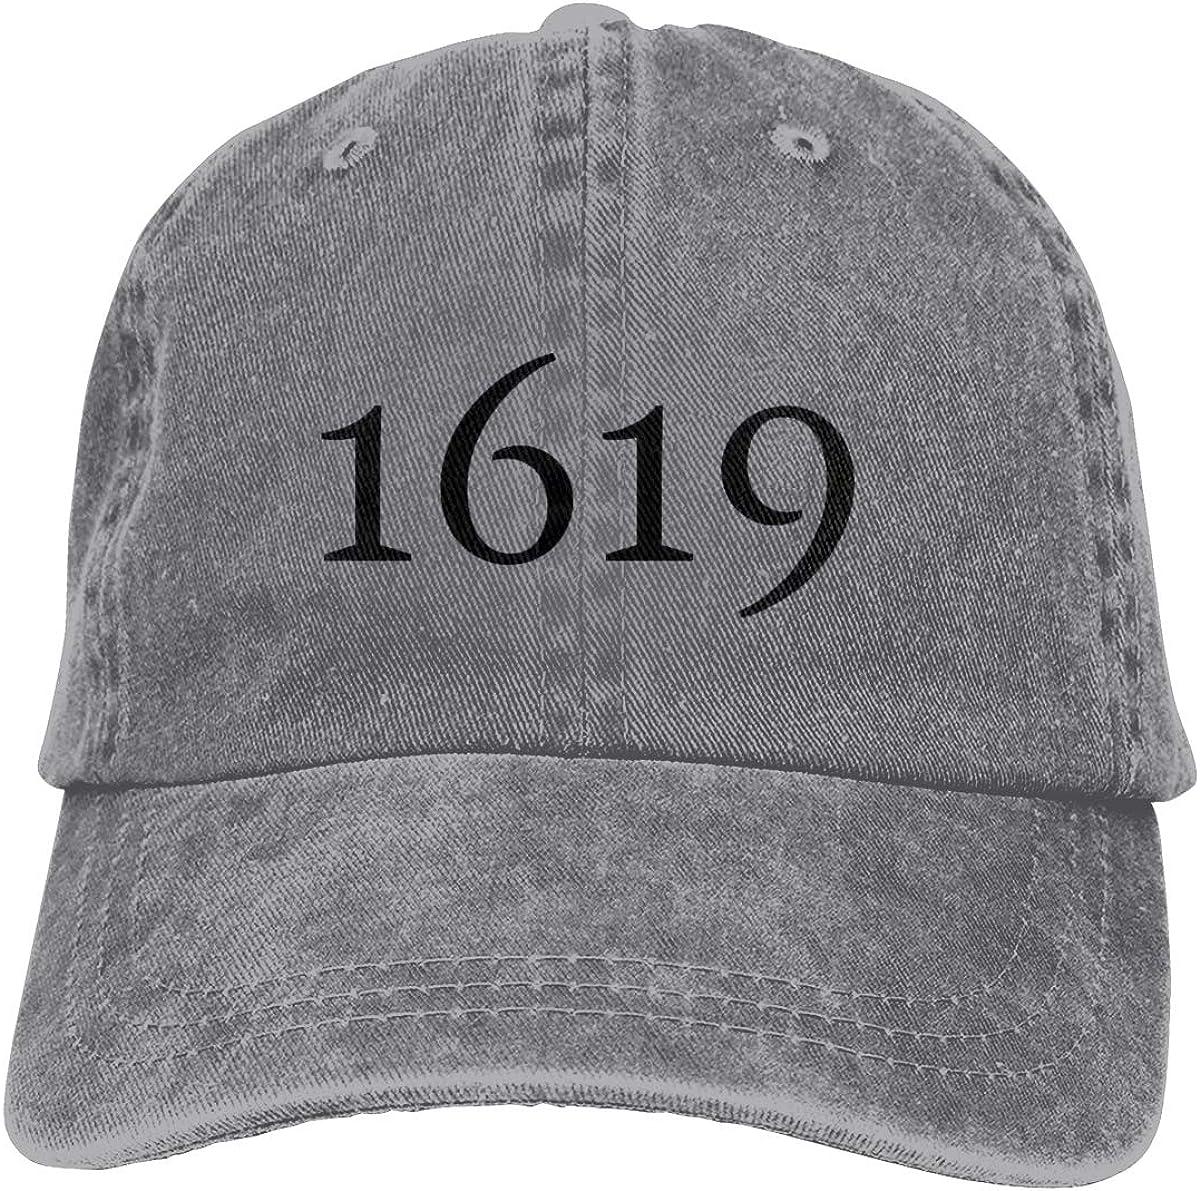 LAOB 1619 lowest price Adjustable Baseball Caps Denim Many popular brands Retro C Cowboy Hats Hat